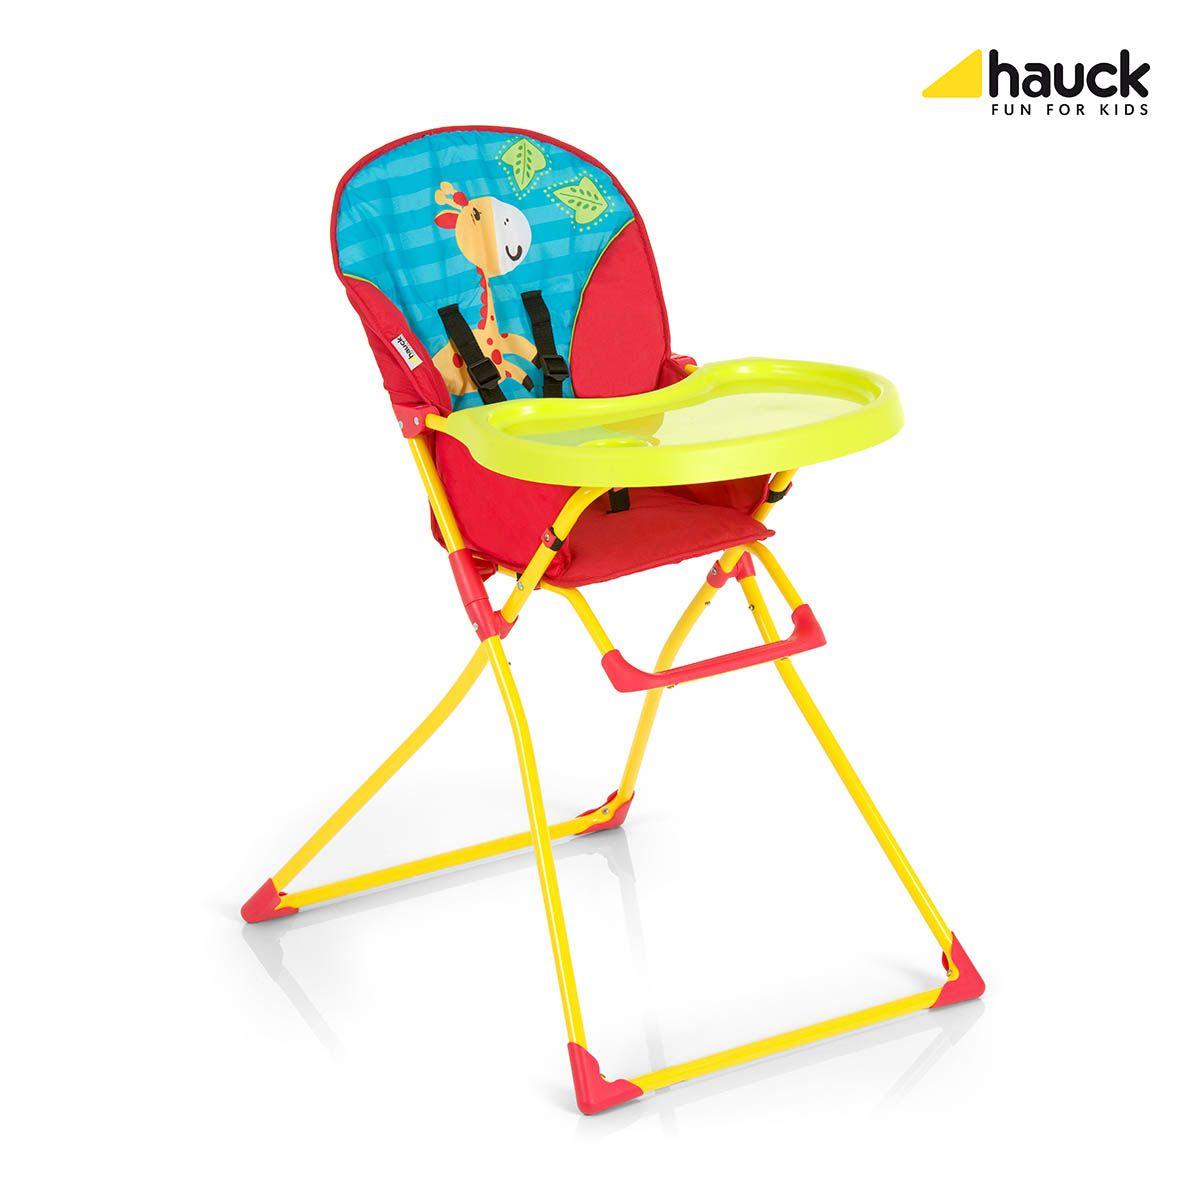 Http Www Hauck De Collection Mac Baby 48 1 14 1 Info Html C 63914 Baby High Chair High Chair Baby Design